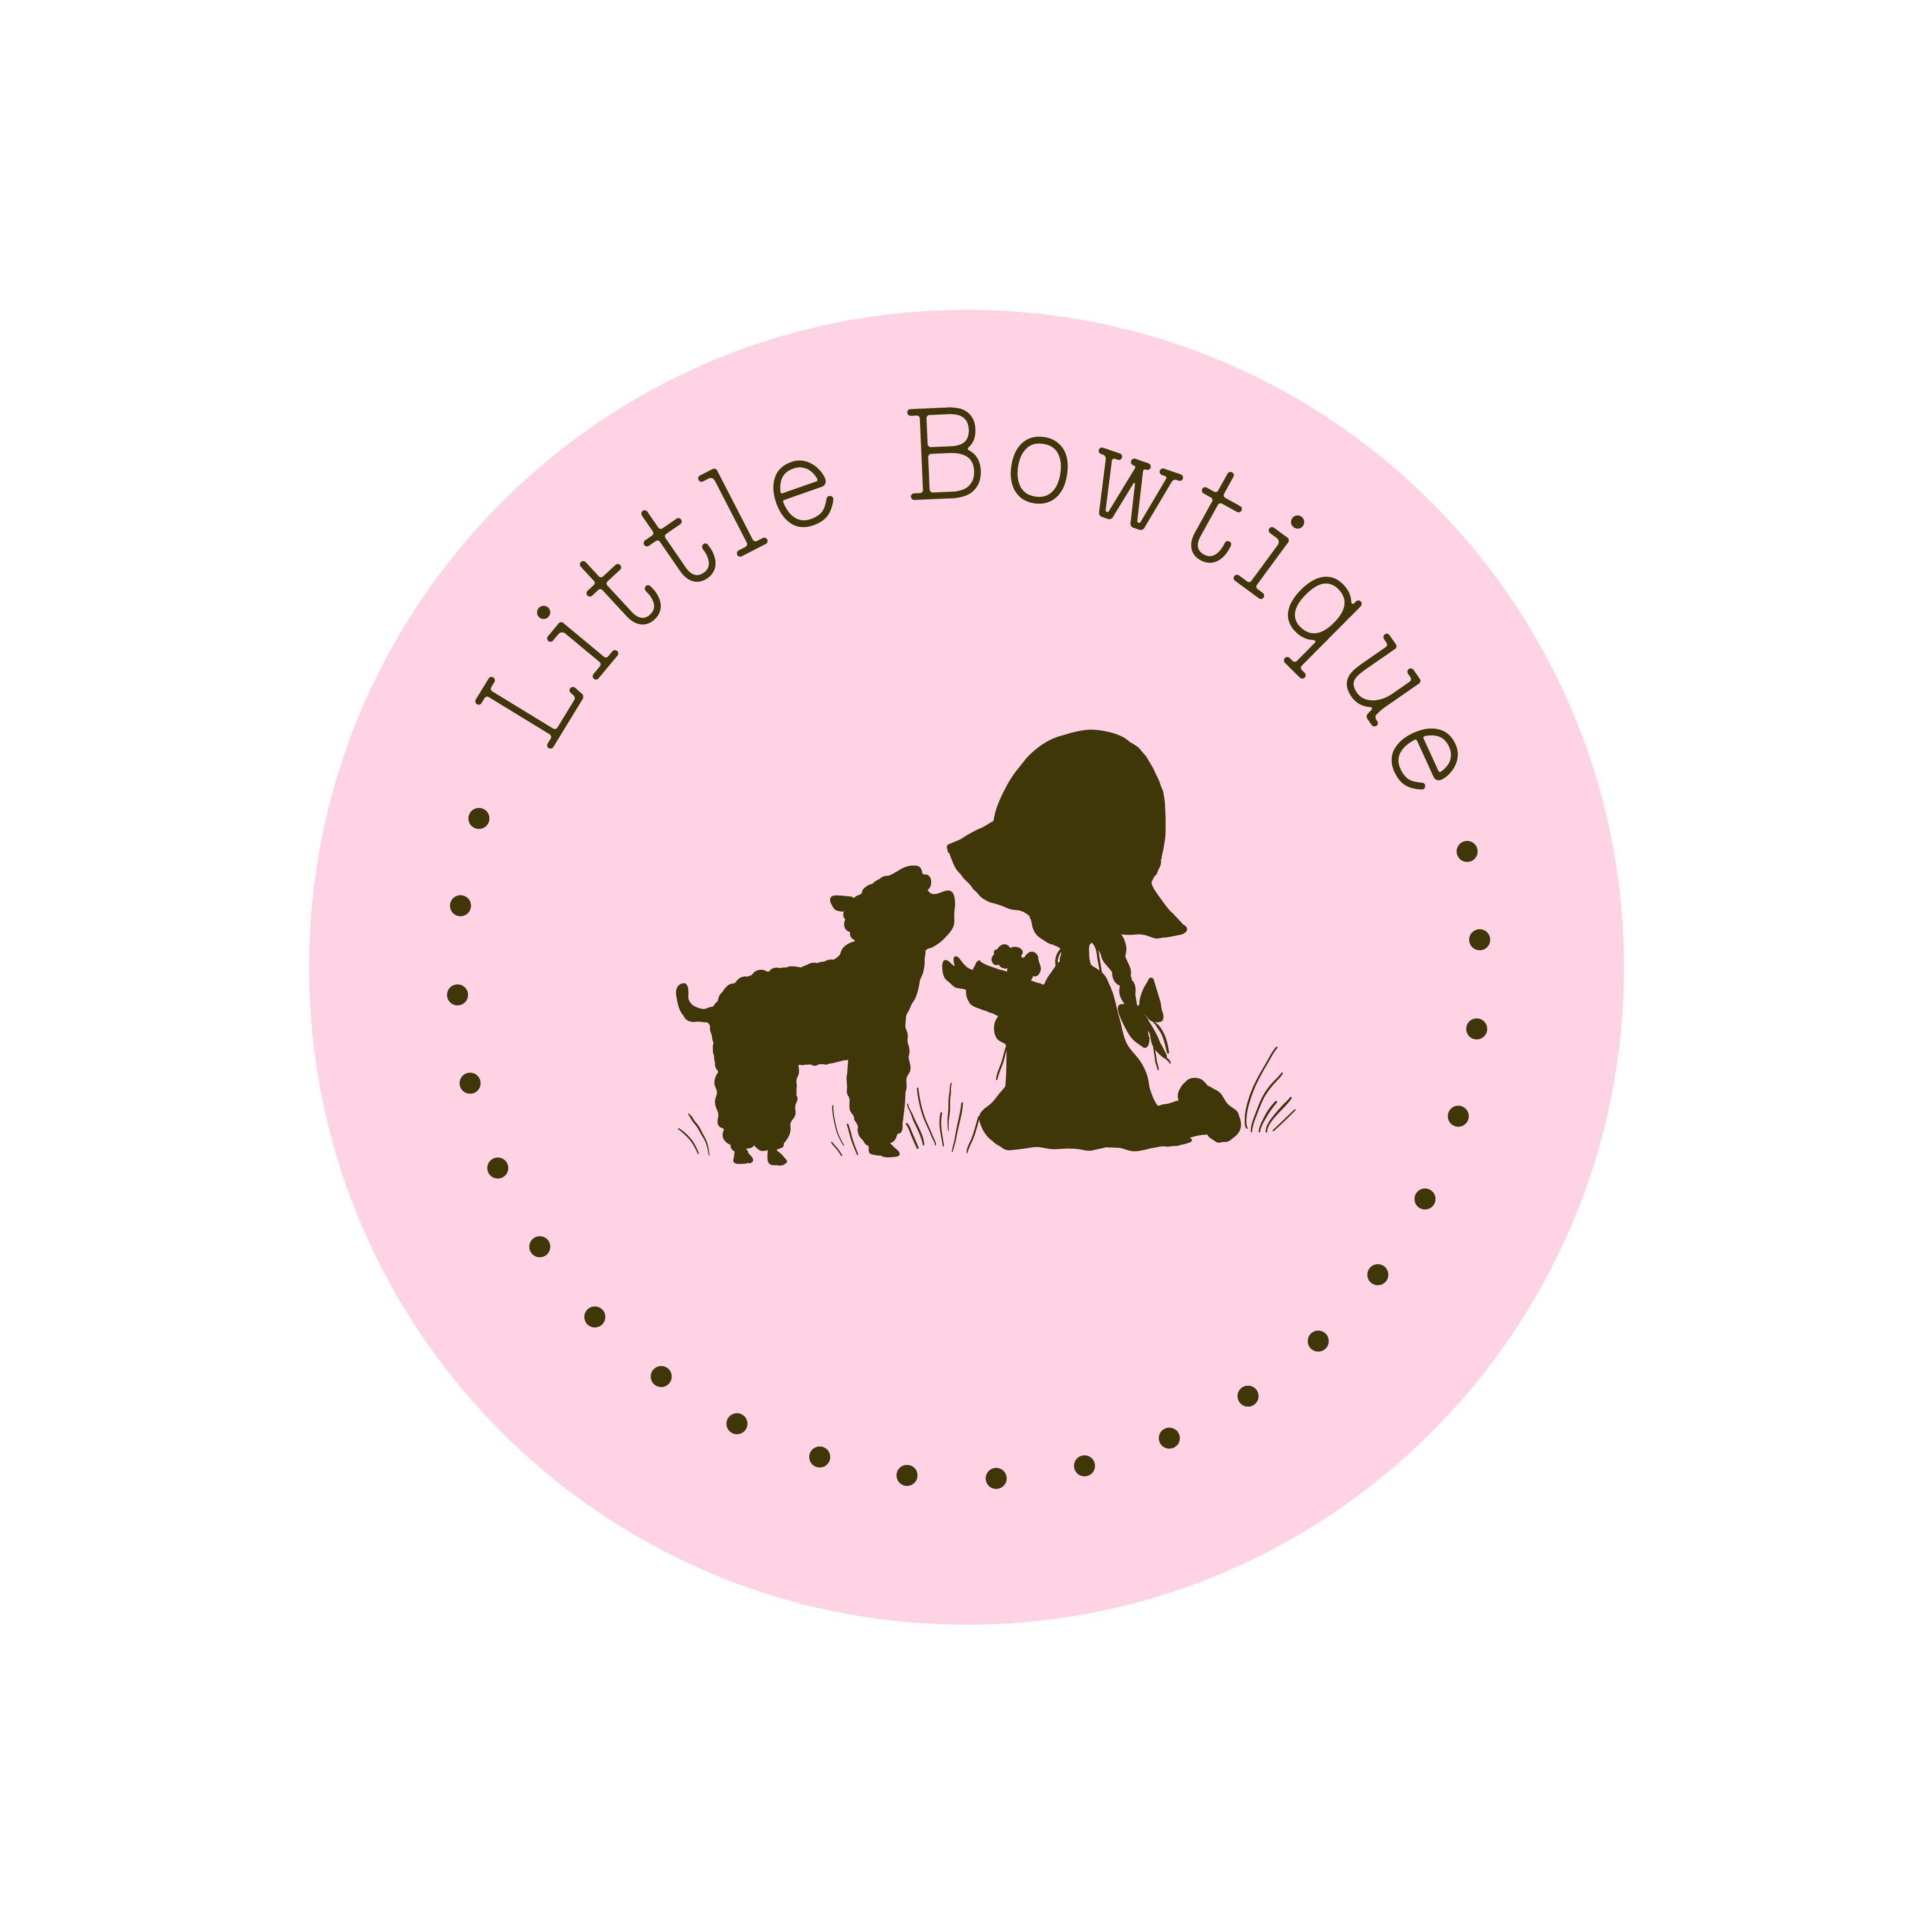 Logo for new brand for hair bows.